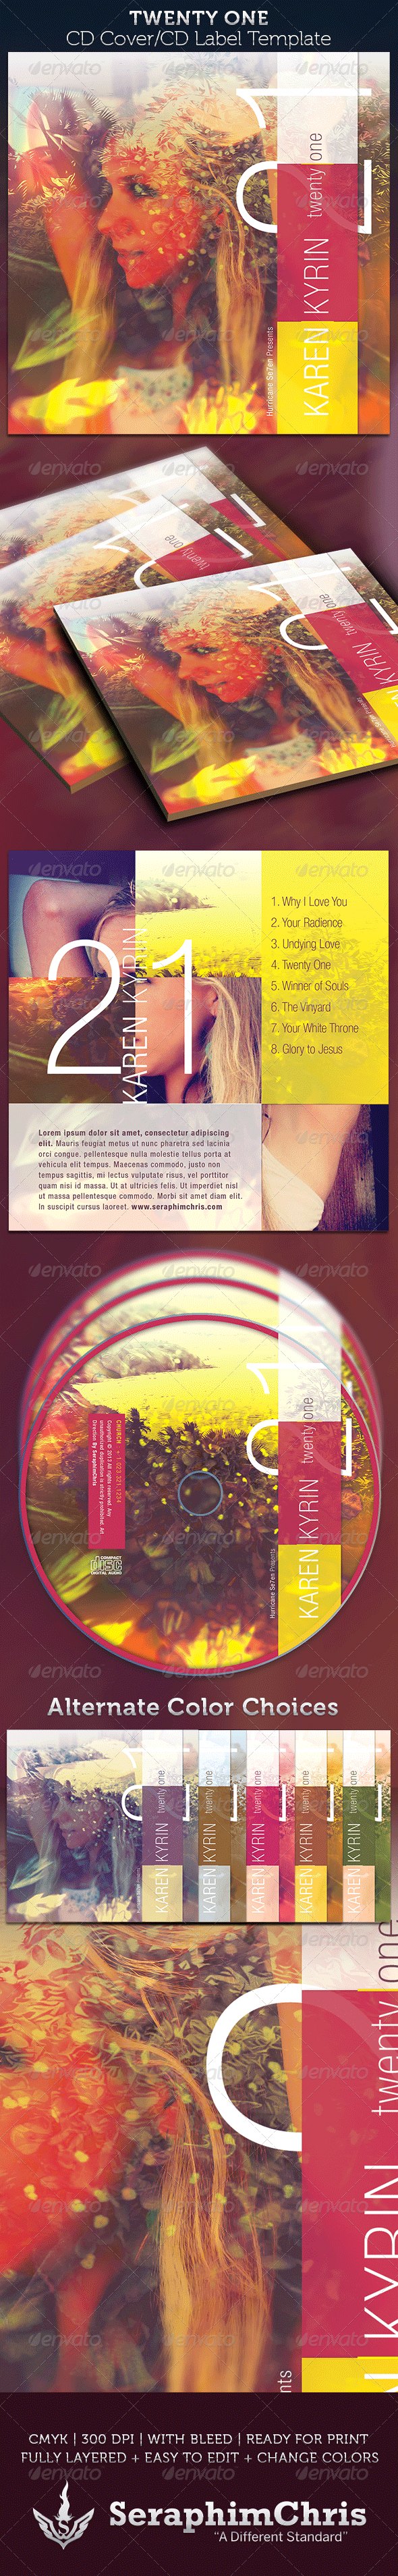 Twenty One: CD Cover Artwork Template - CD & DVD Artwork Print Templates